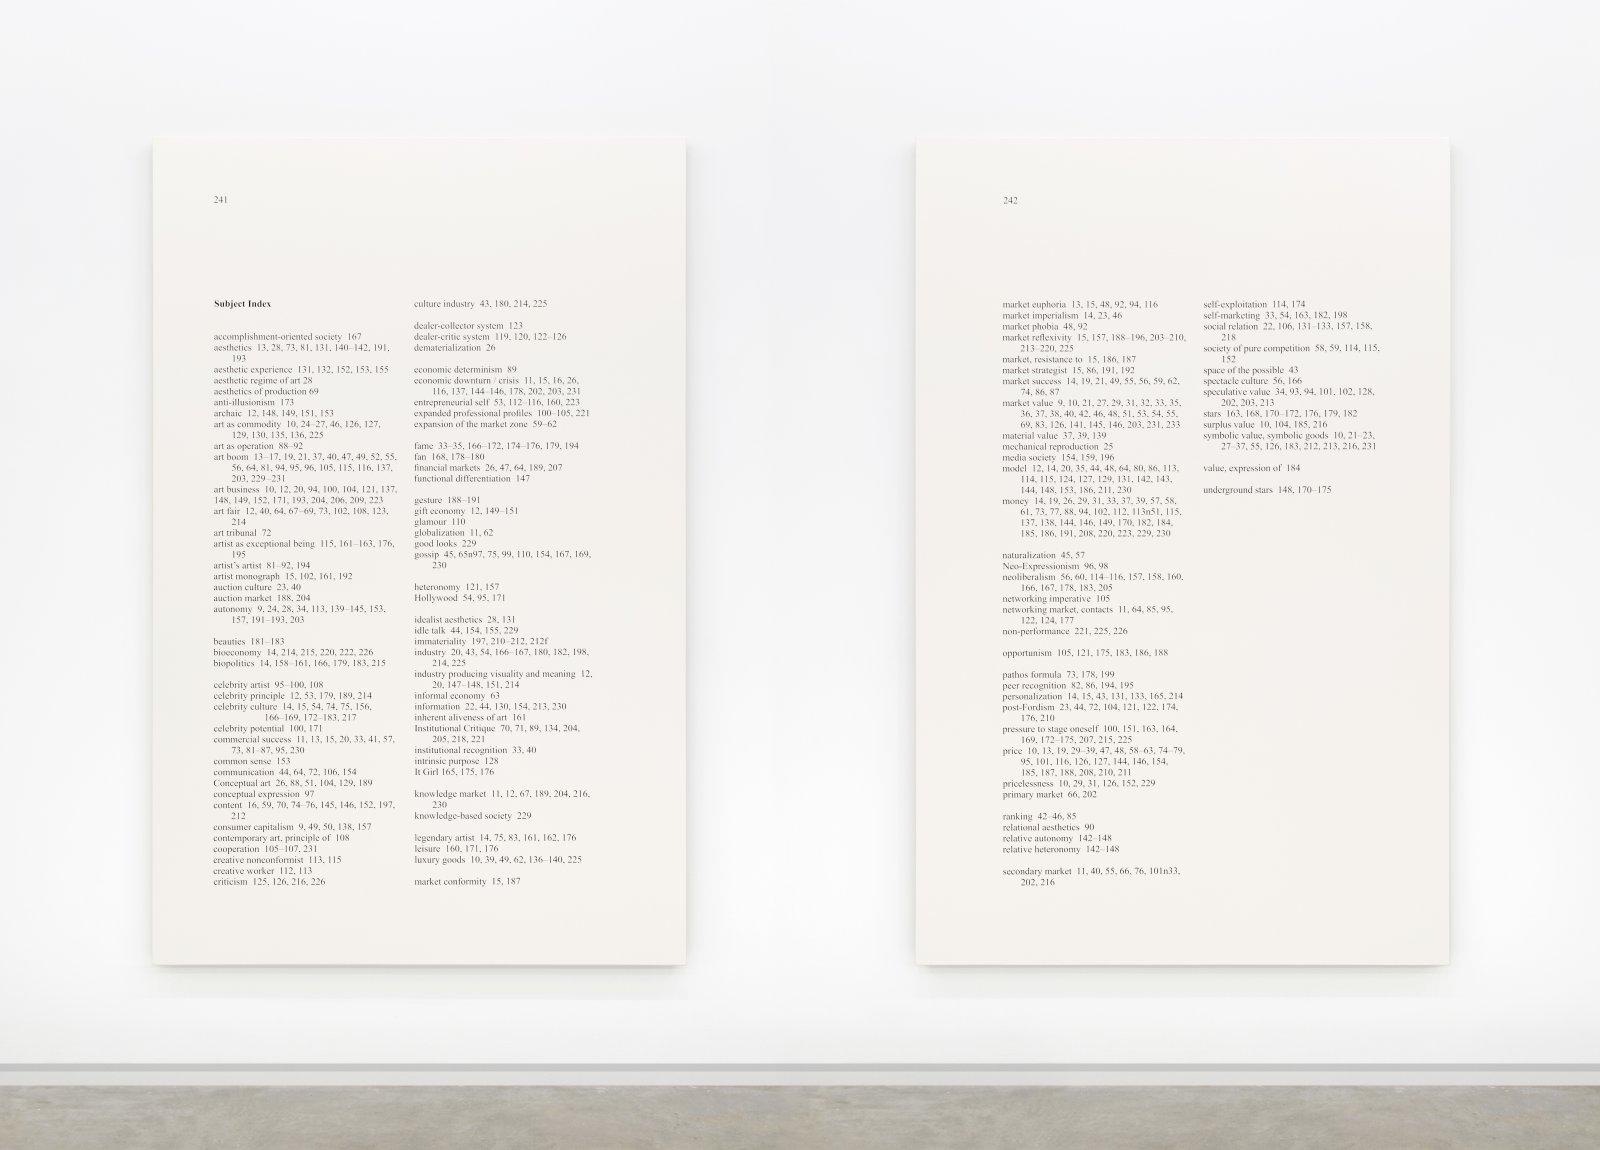 Ron Terada,High Price, 2012, acrylic on linen, 95 x 61 in. (241 x 155 cm)